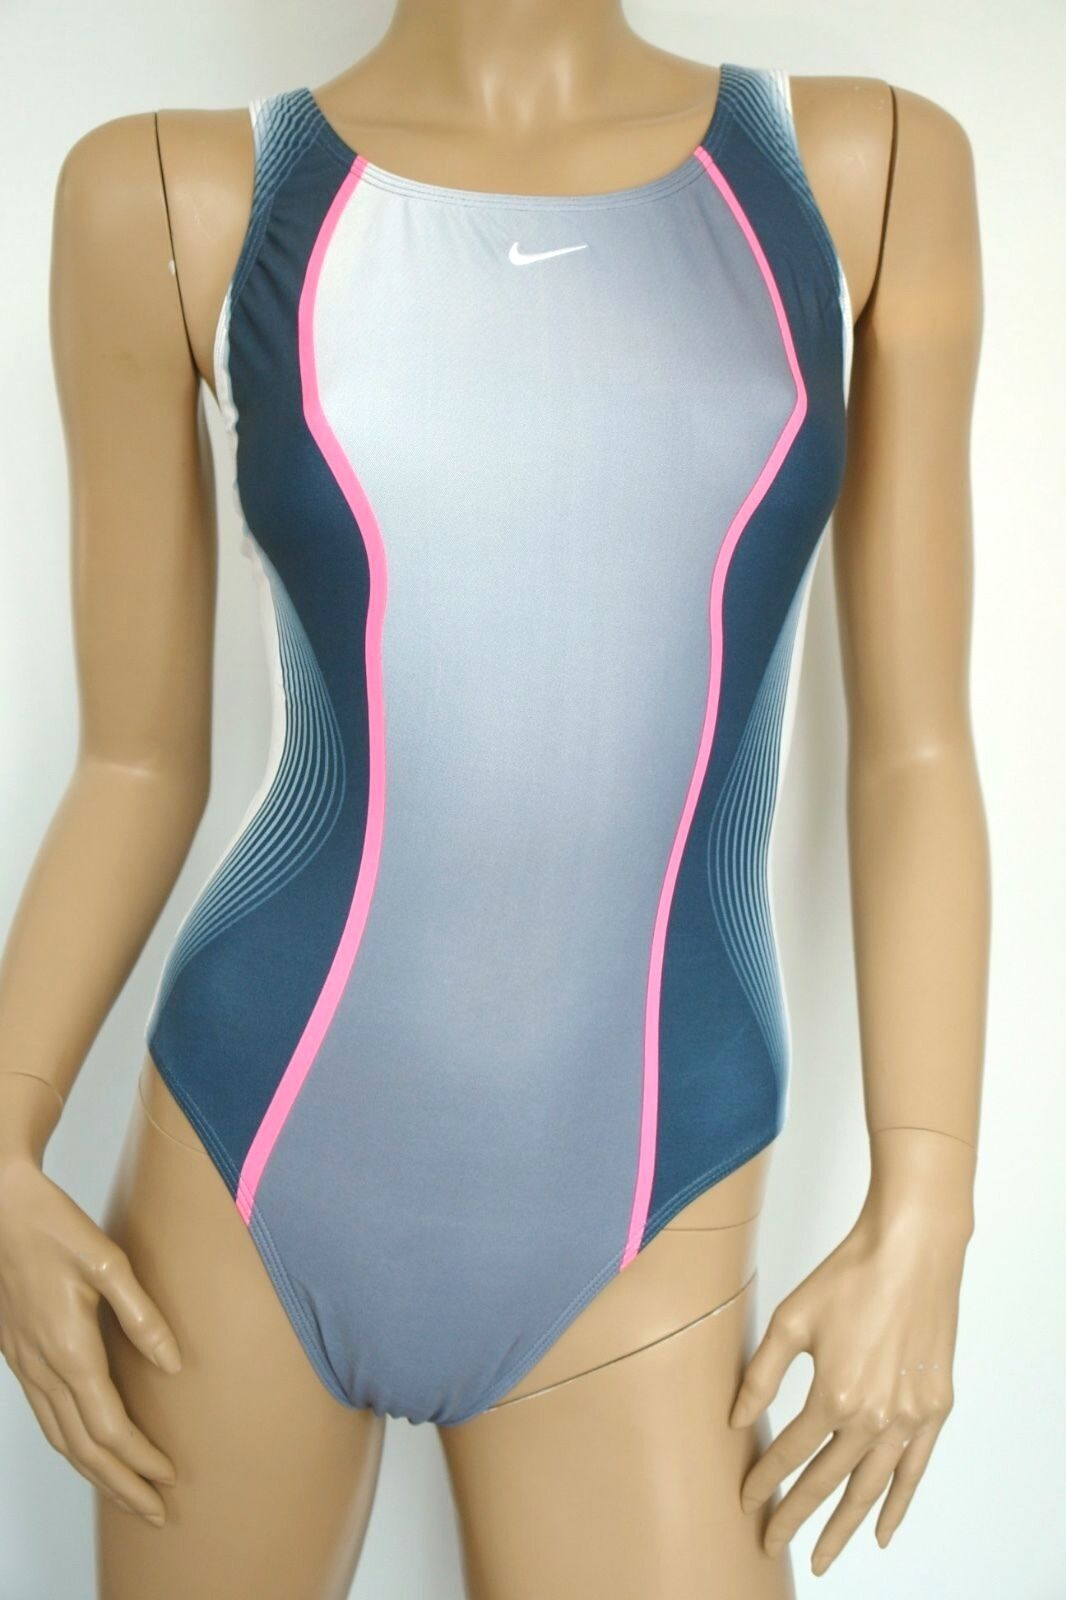 nike swim * sportlicher Damen Badeanzug * Modell EWB2139 * grau / weiß * NEU